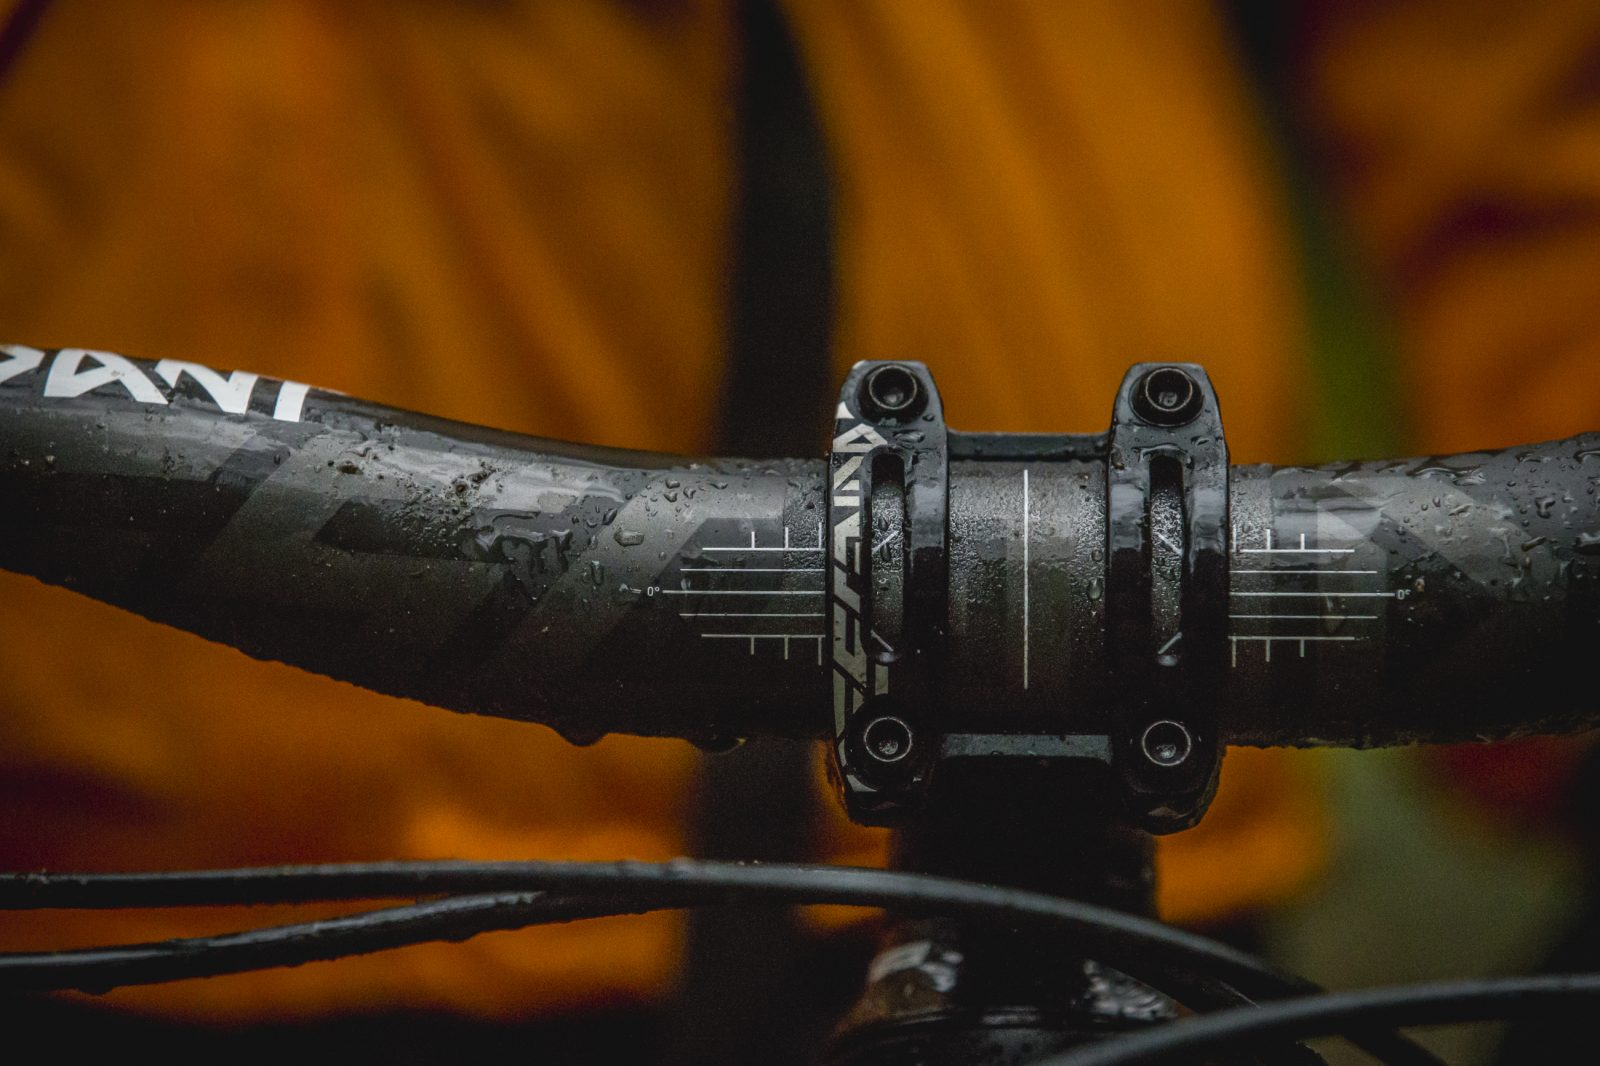 TruVativ Descendant CoLab Handlebar Kyle Strait Downhill 35mm Clamp 808mm